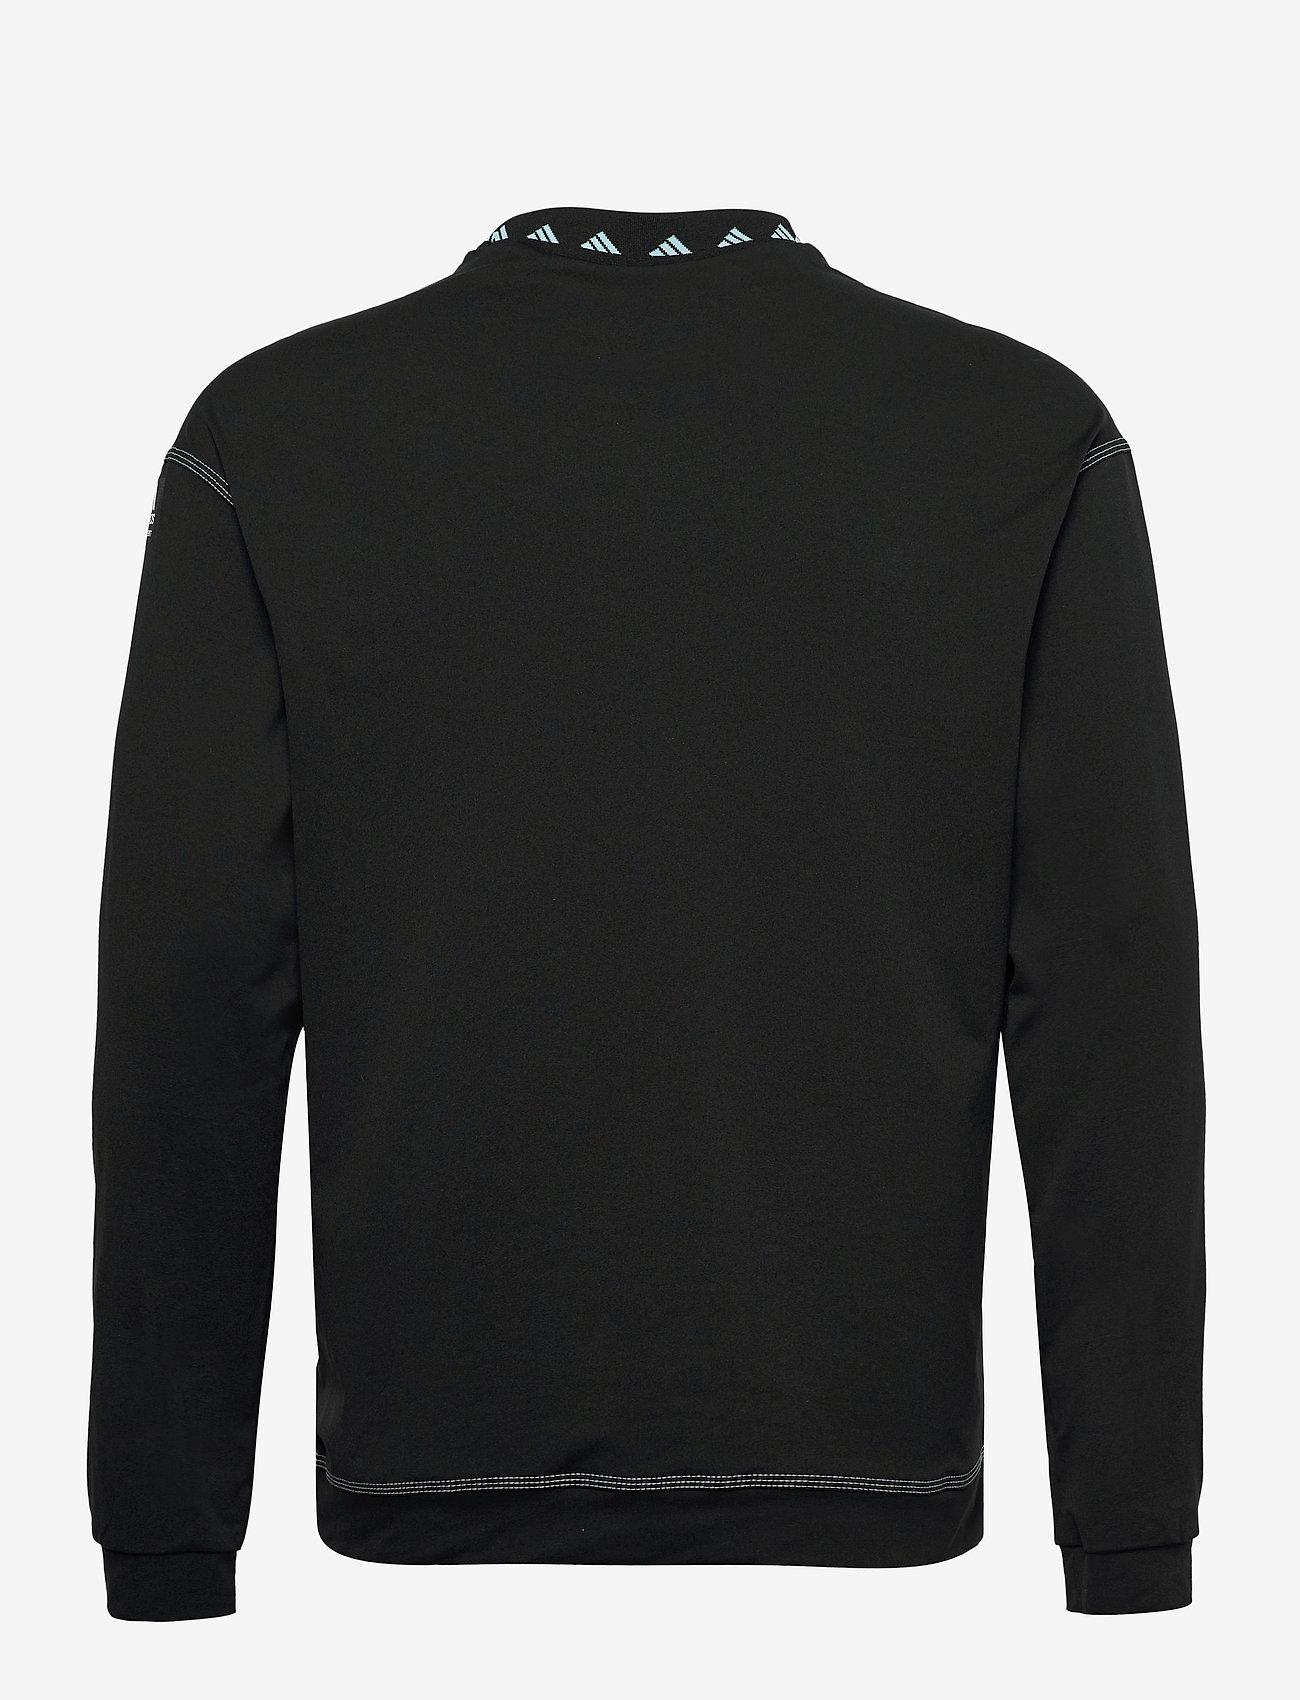 adidas Golf - EQPMNT WIND CRW - golf jackets - black - 1